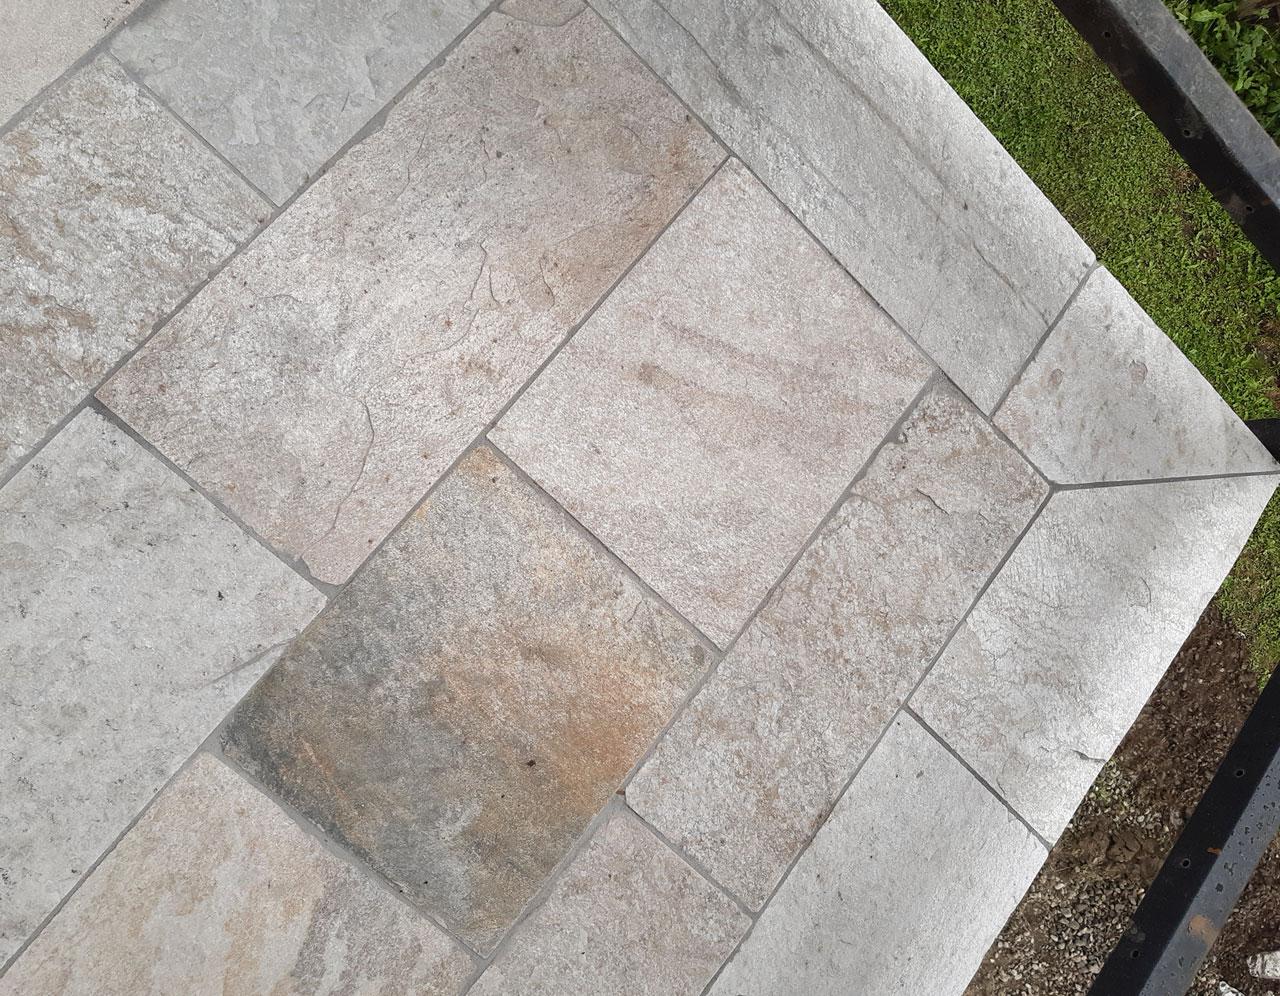 Niederkofler Bau, Natursteinverlegung, Bodenplatten, Silberquarzit, Pfitsch, 20200924-162738, Home, 1280x996px